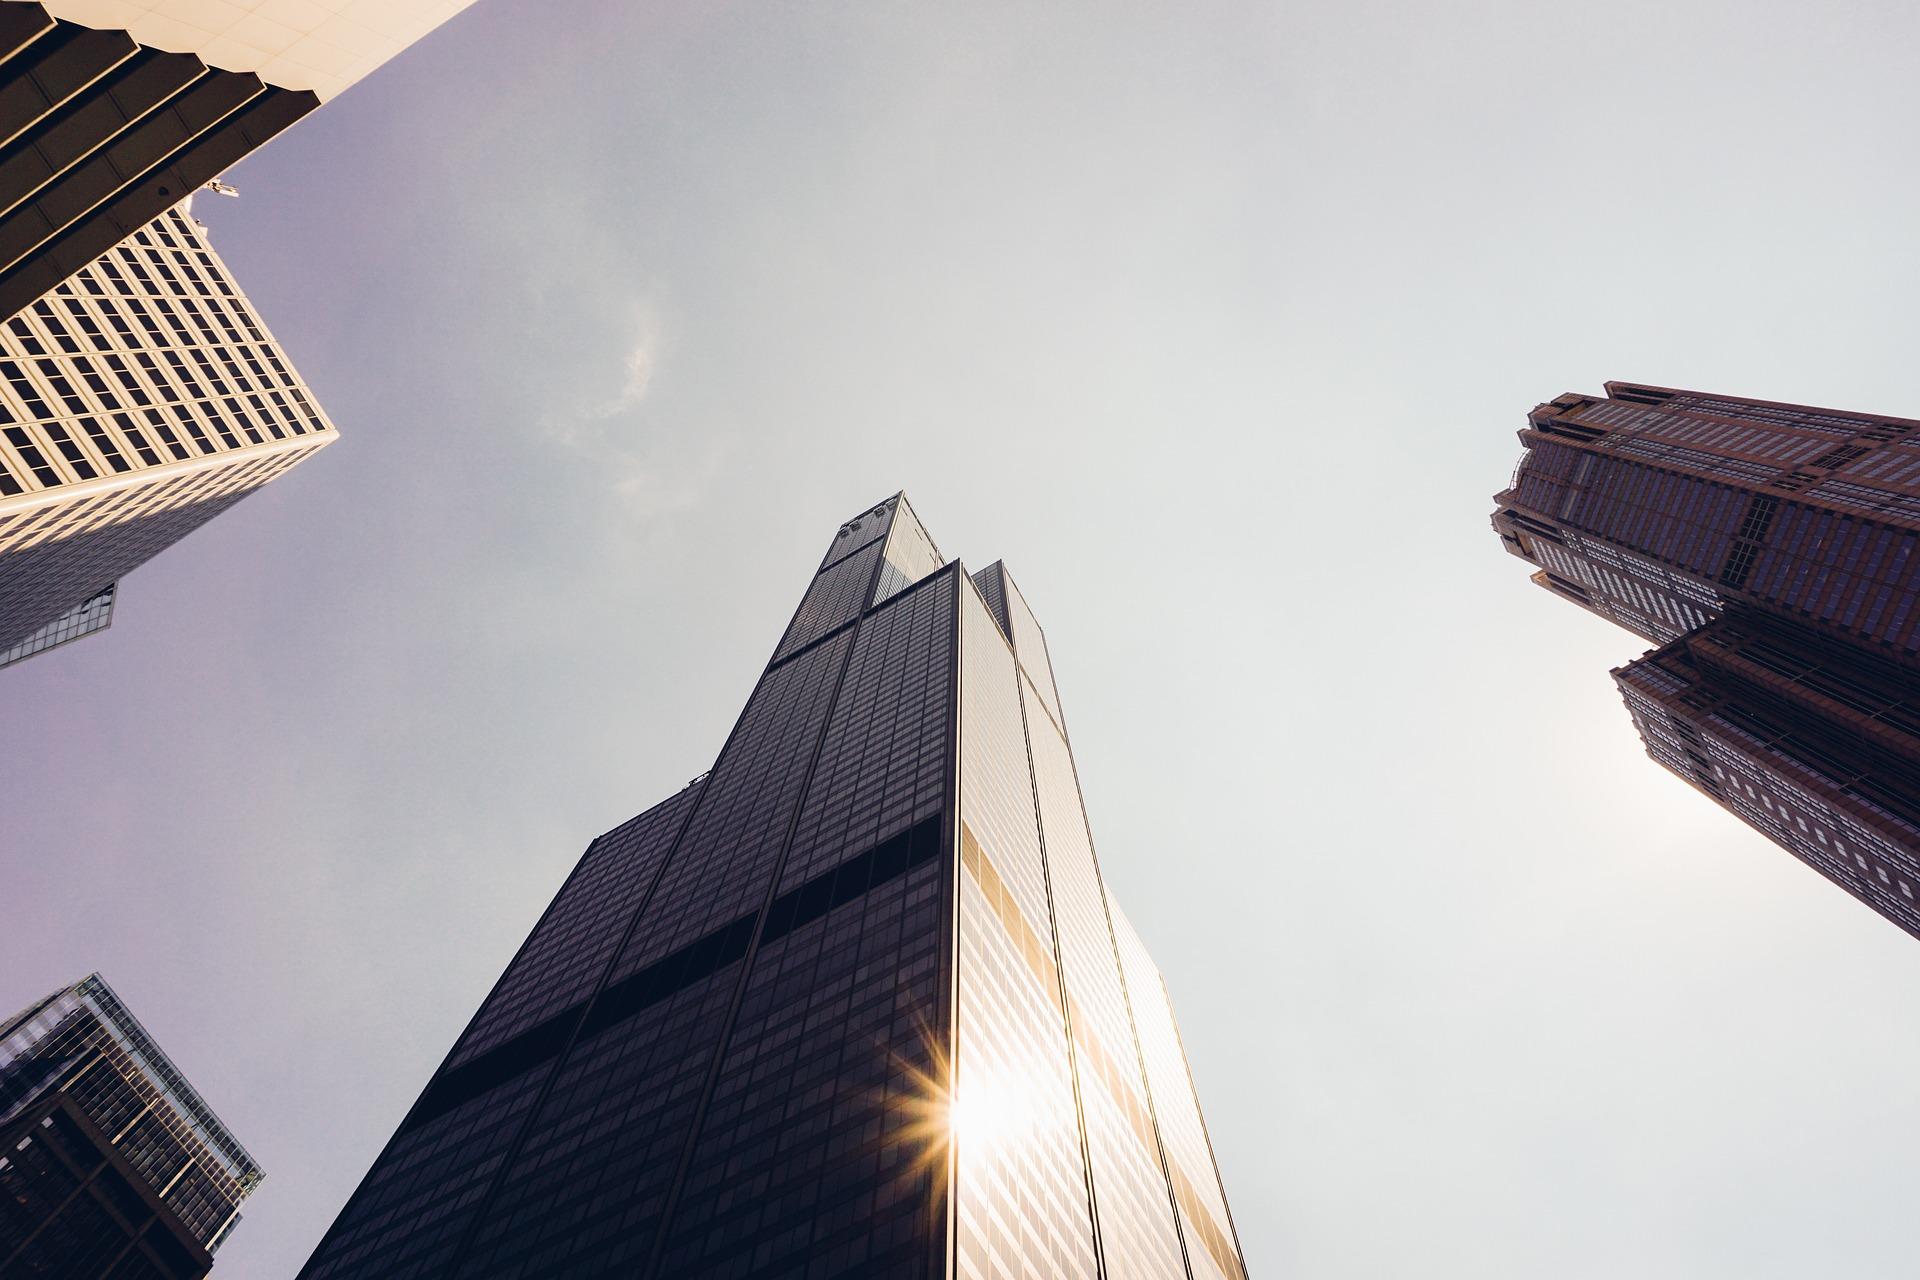 NYダウ、S&P500が過去最高値を更新バイデン大統領の就任に安堵で株価上昇